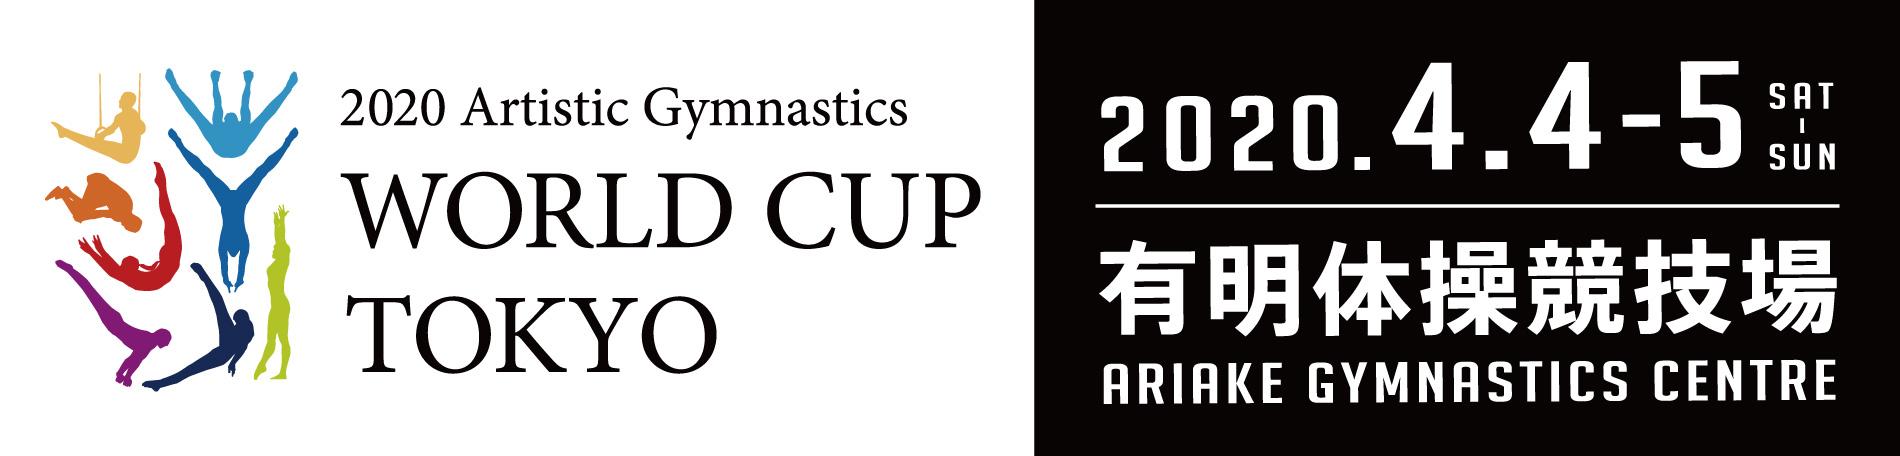 2020 Artistic Gymnastics World Cup Tokyo